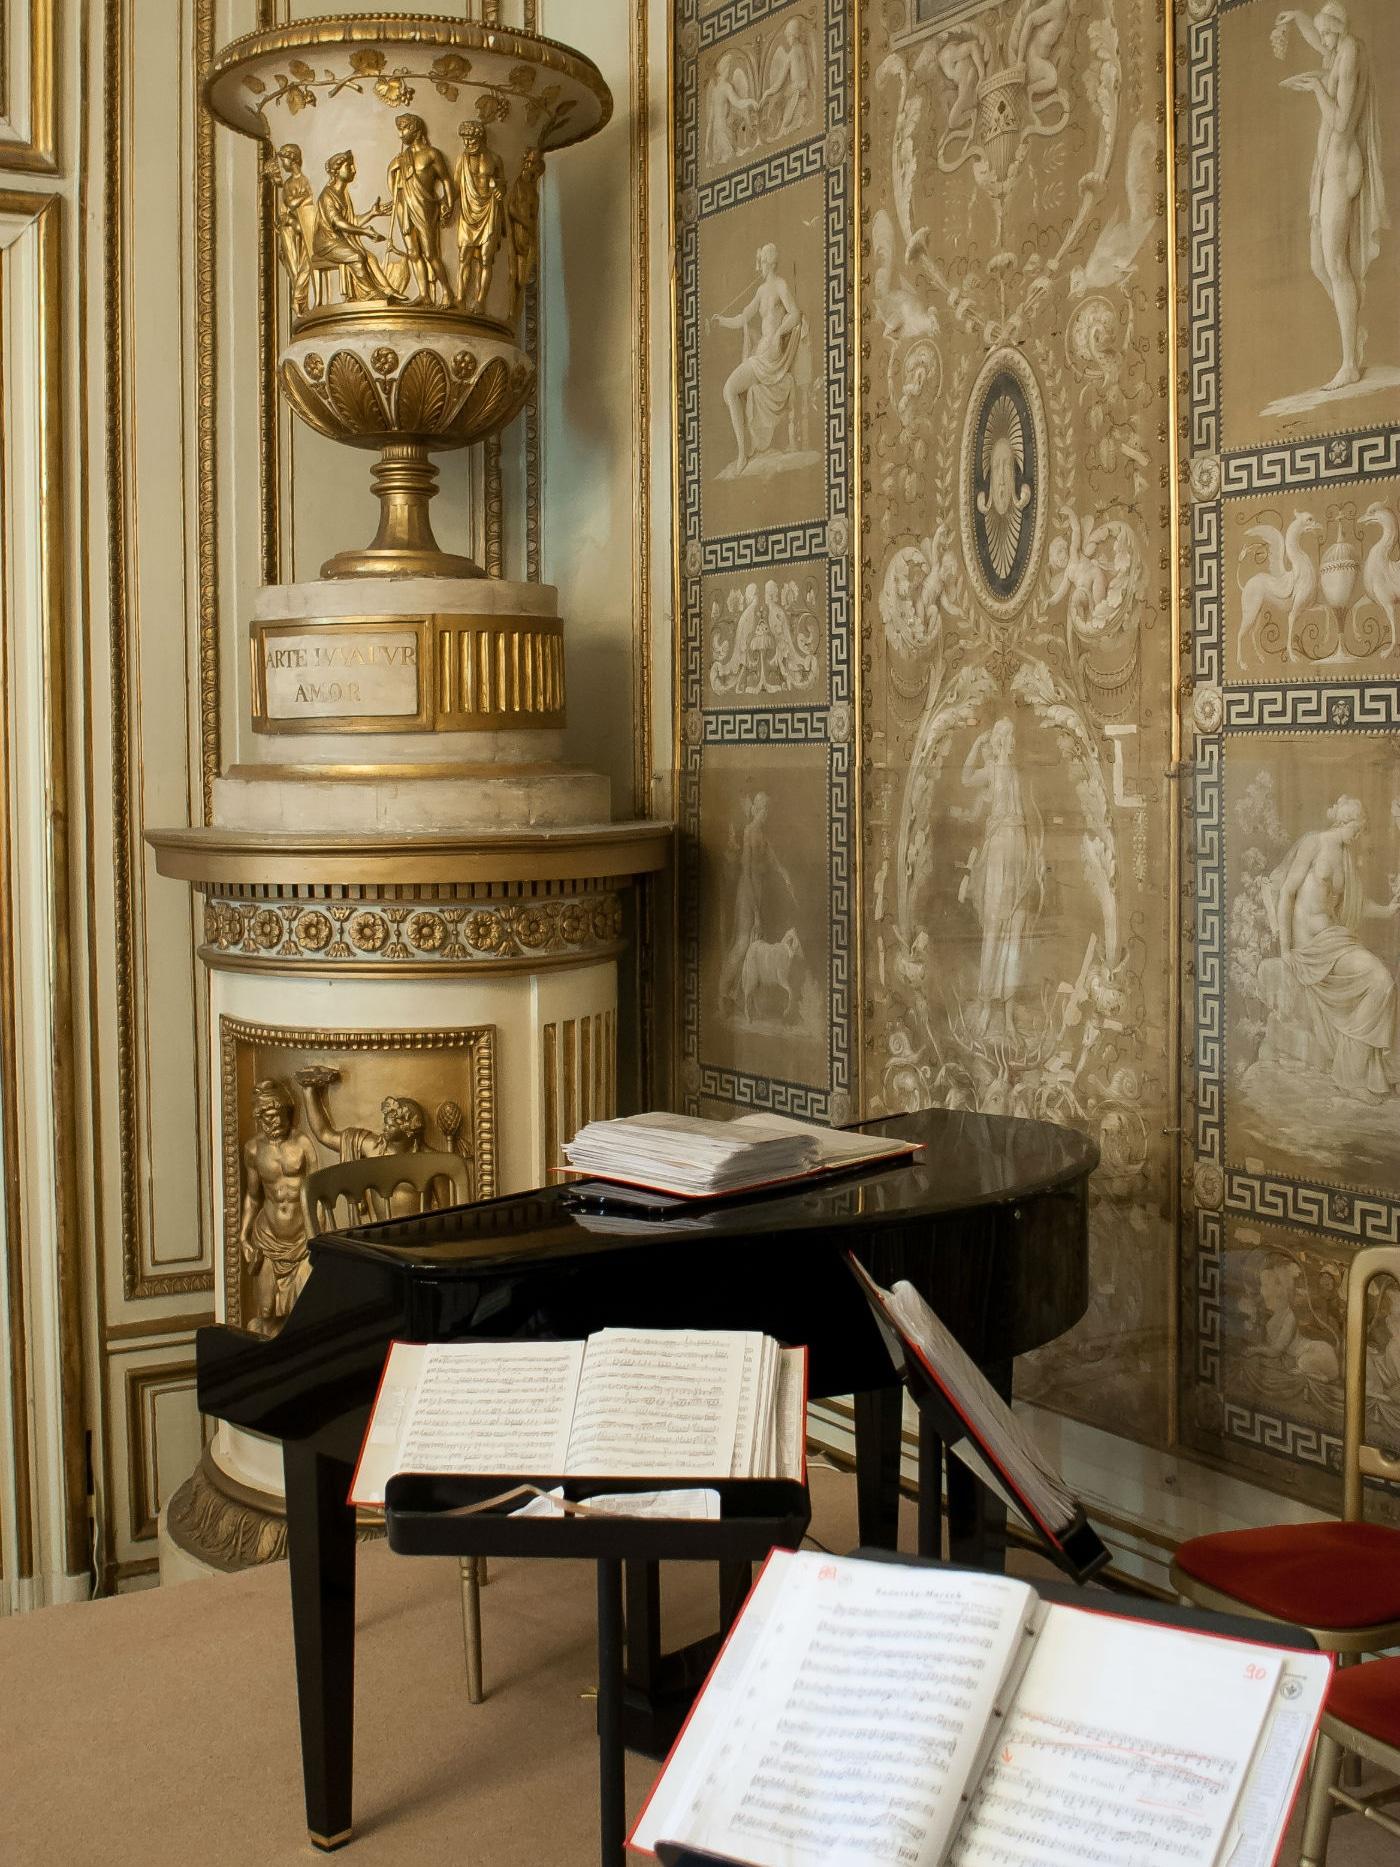 Maria-Theresien-Saal Palais Auersperg - Exklusiv Konzerte Wiener Residenzorchester